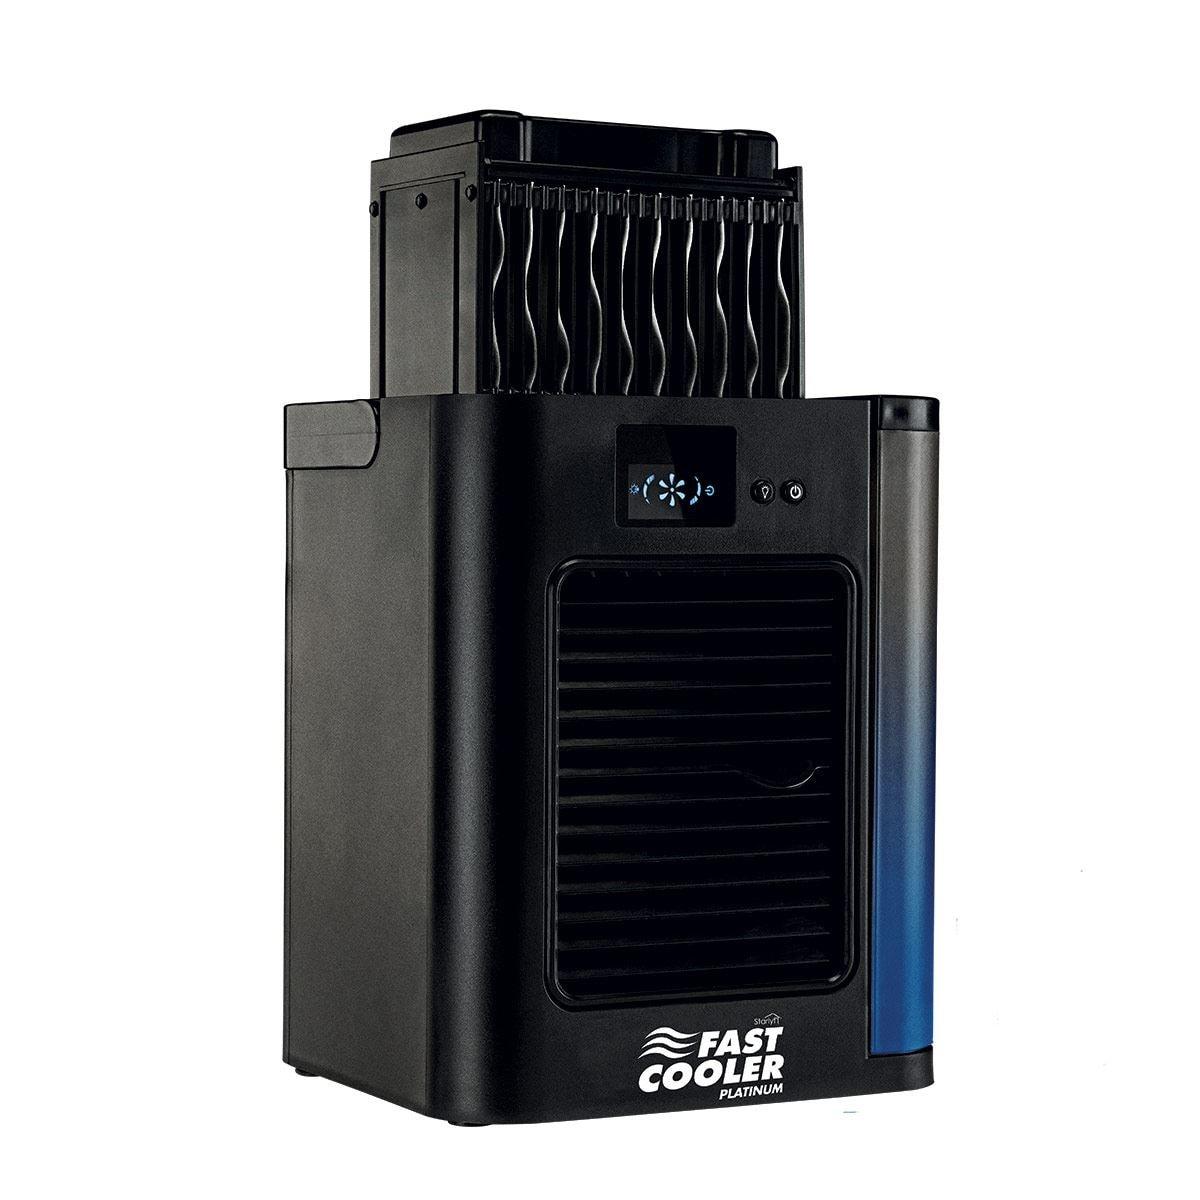 Fast Cooler Platinum Enfriador